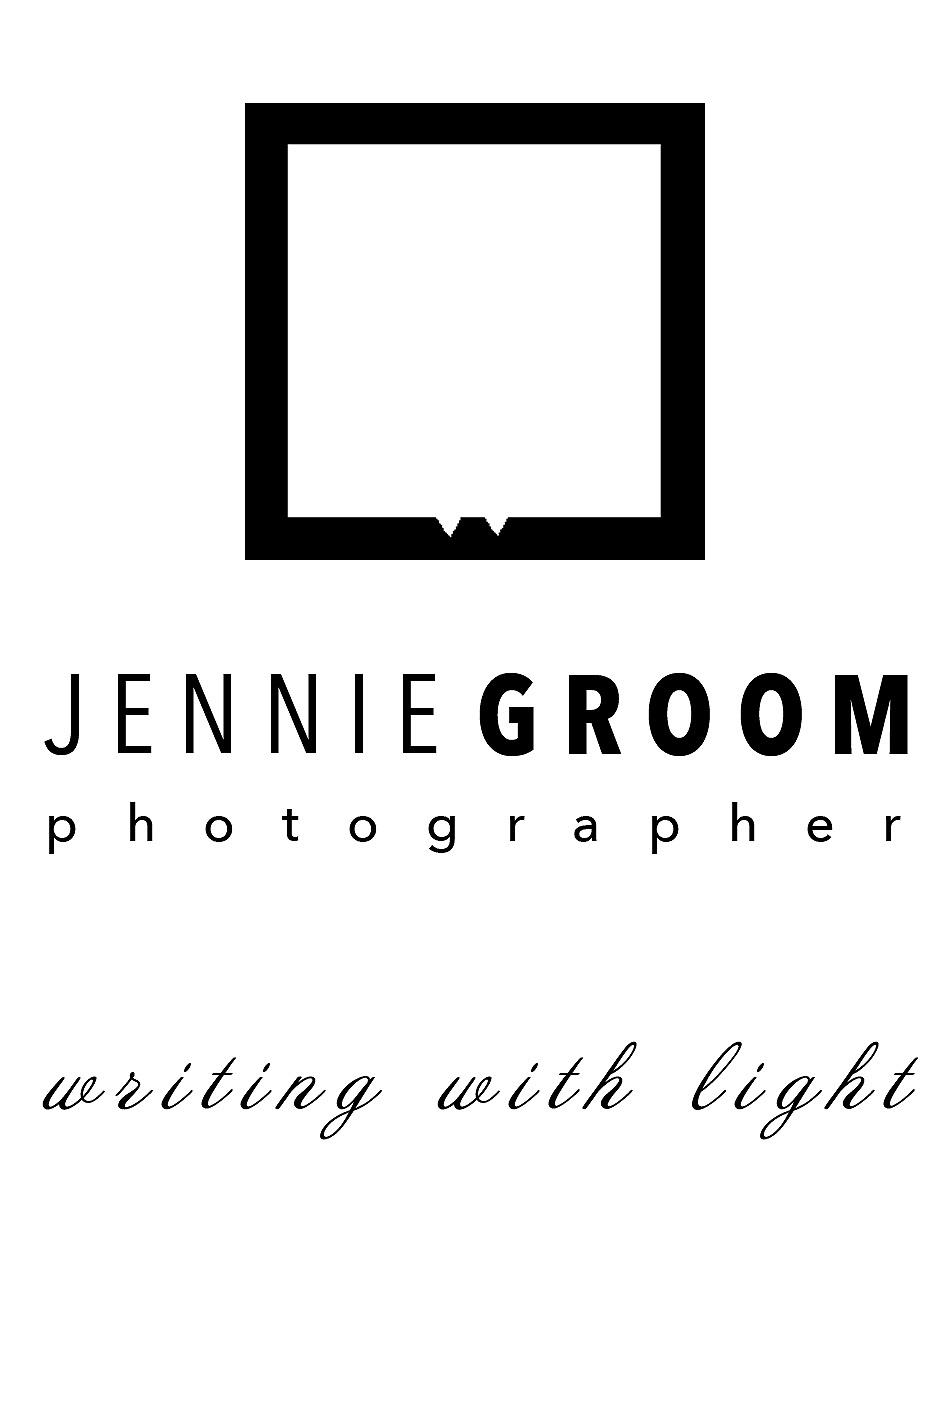 Jennie Groom Photographer